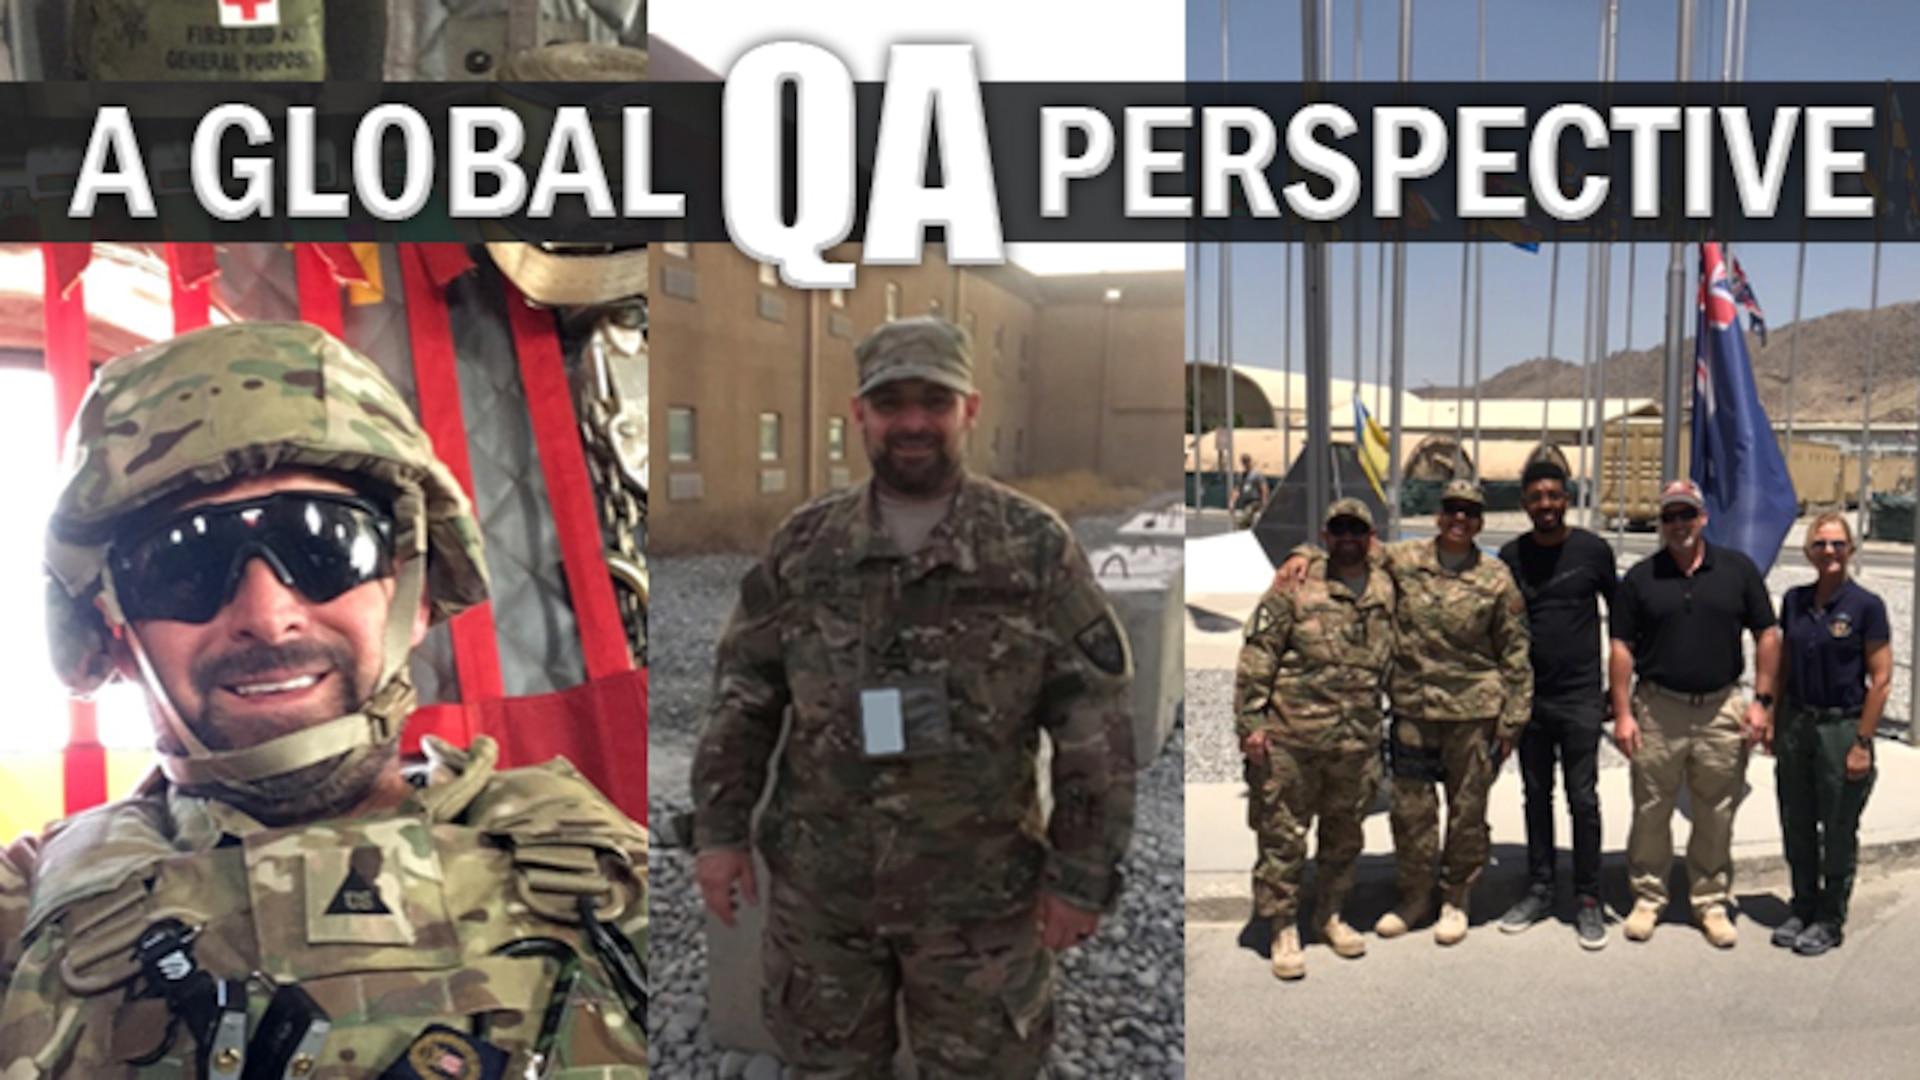 A Global QA Perspective